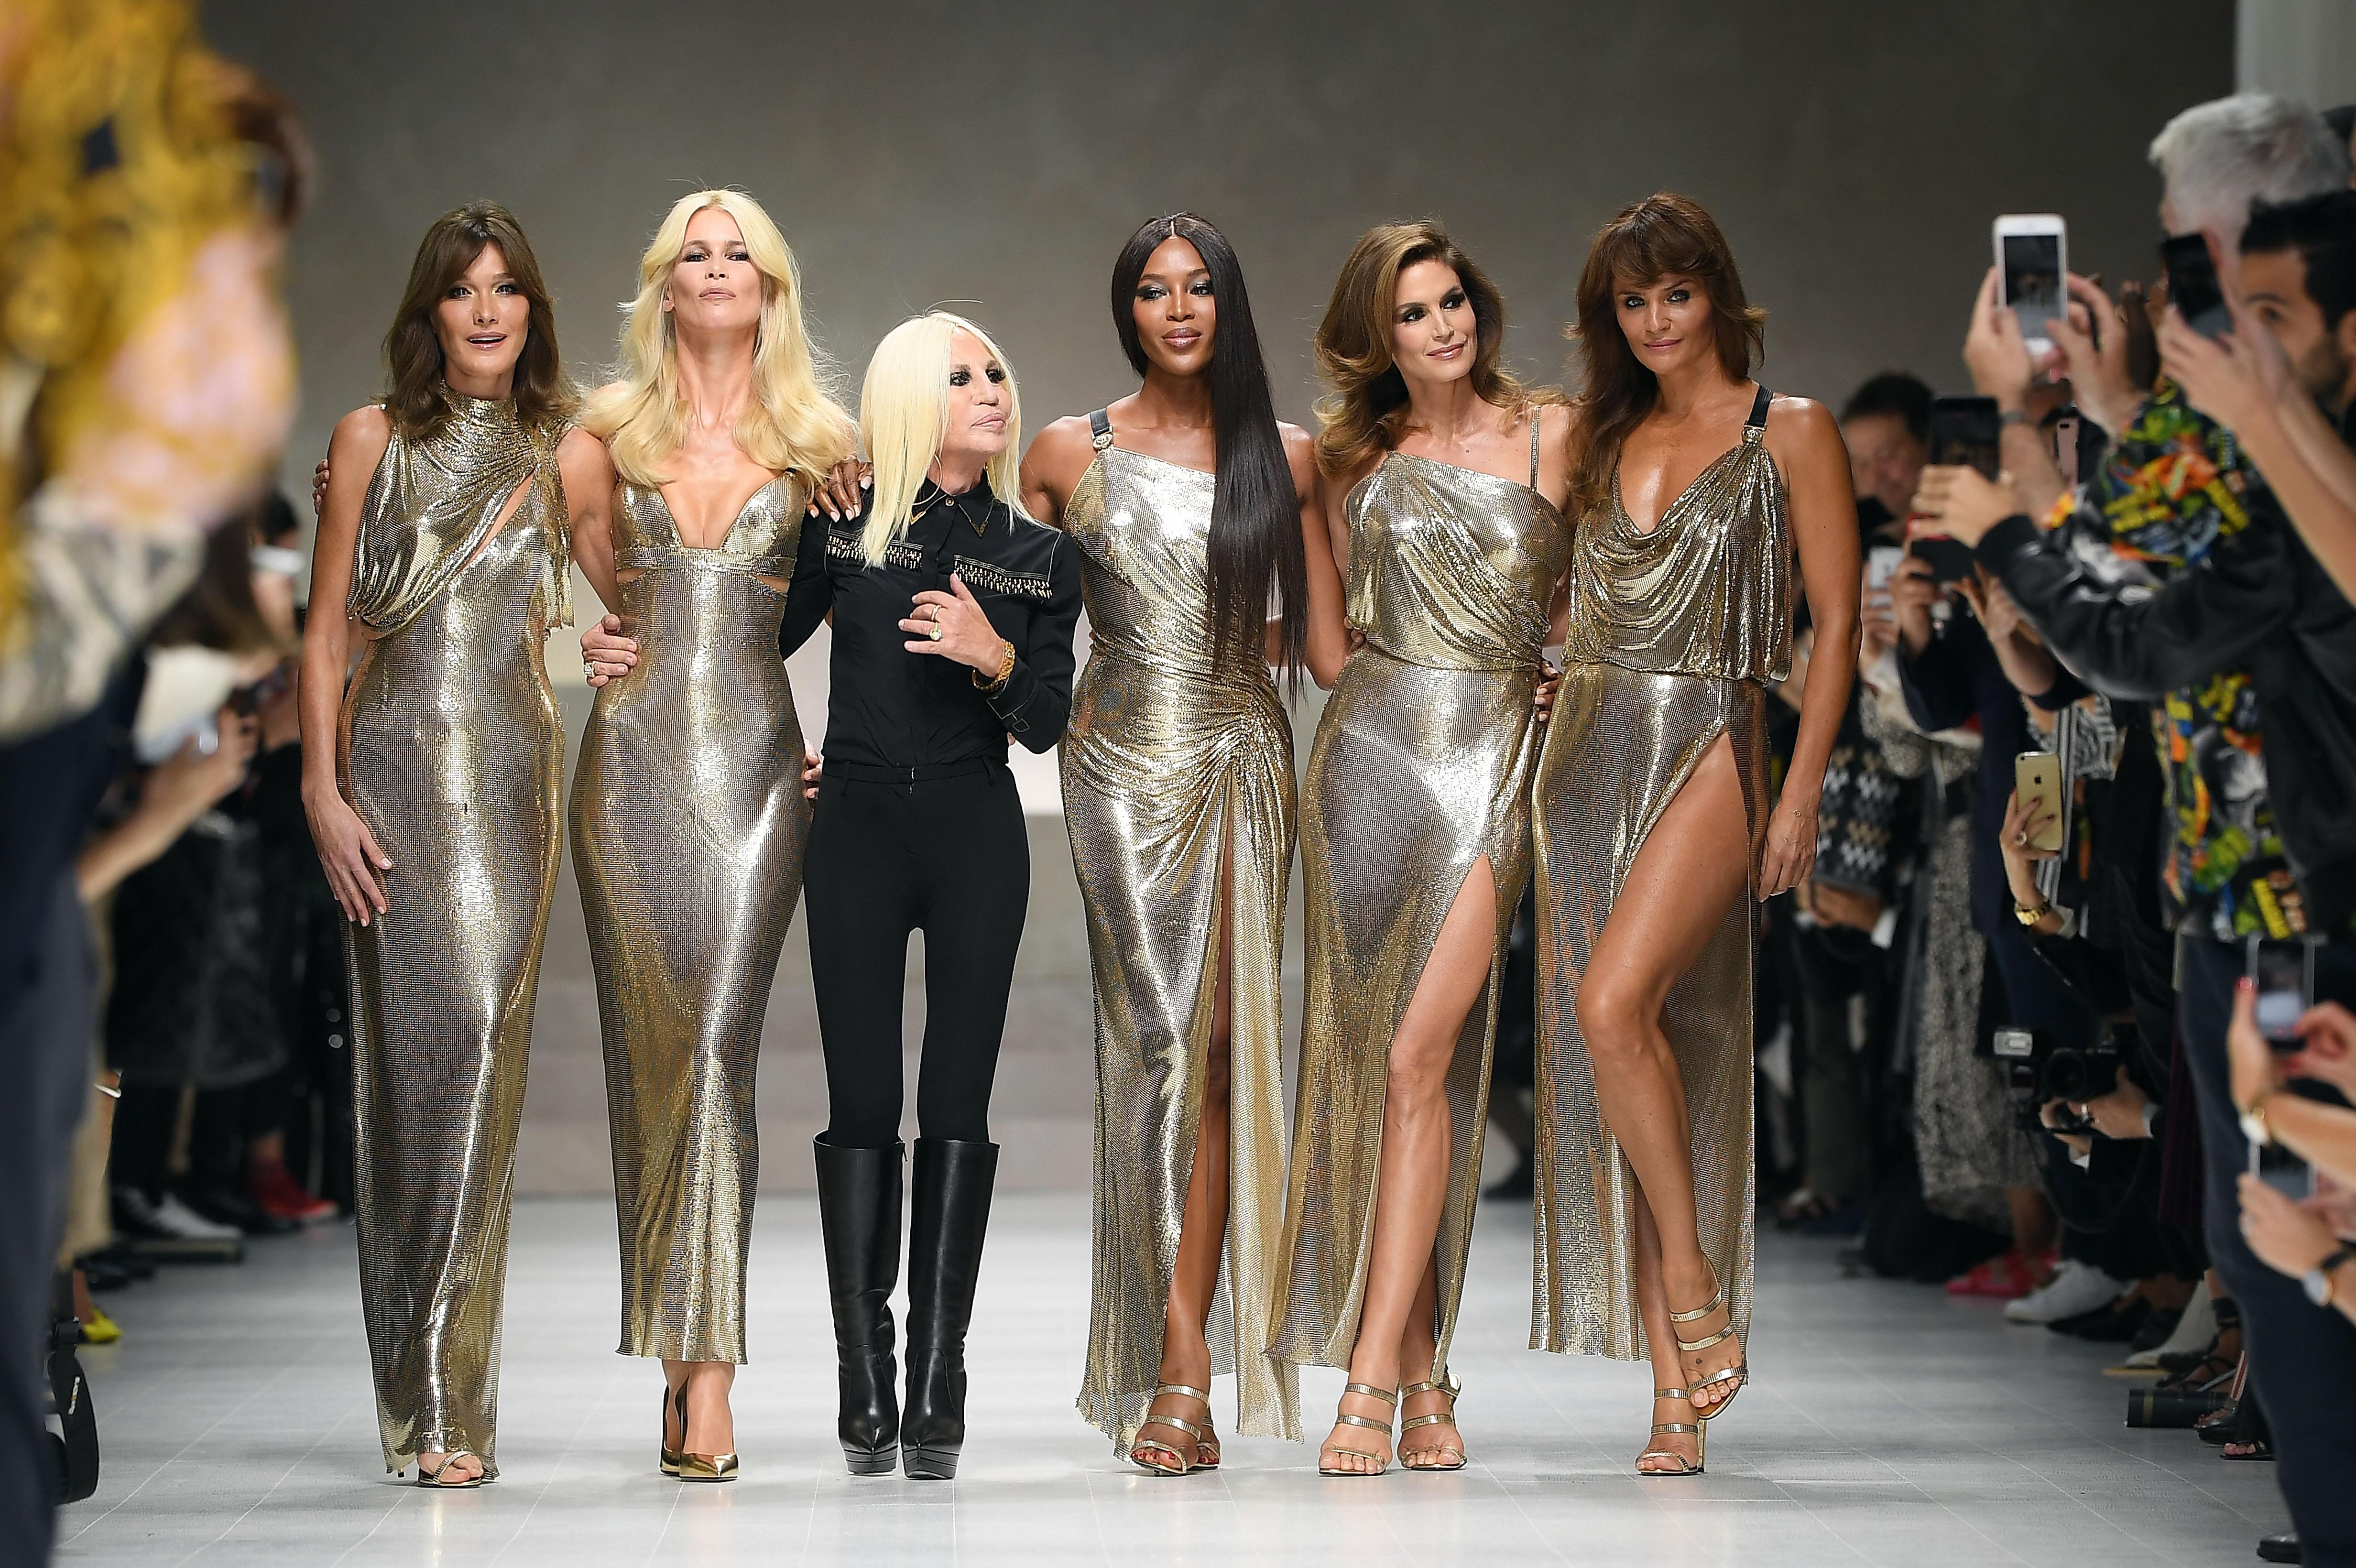 Carla Bruni, Claudia Schiffer, Donatella Versace, Naomi Campbell, Cindy Crawford, Helena Christensen